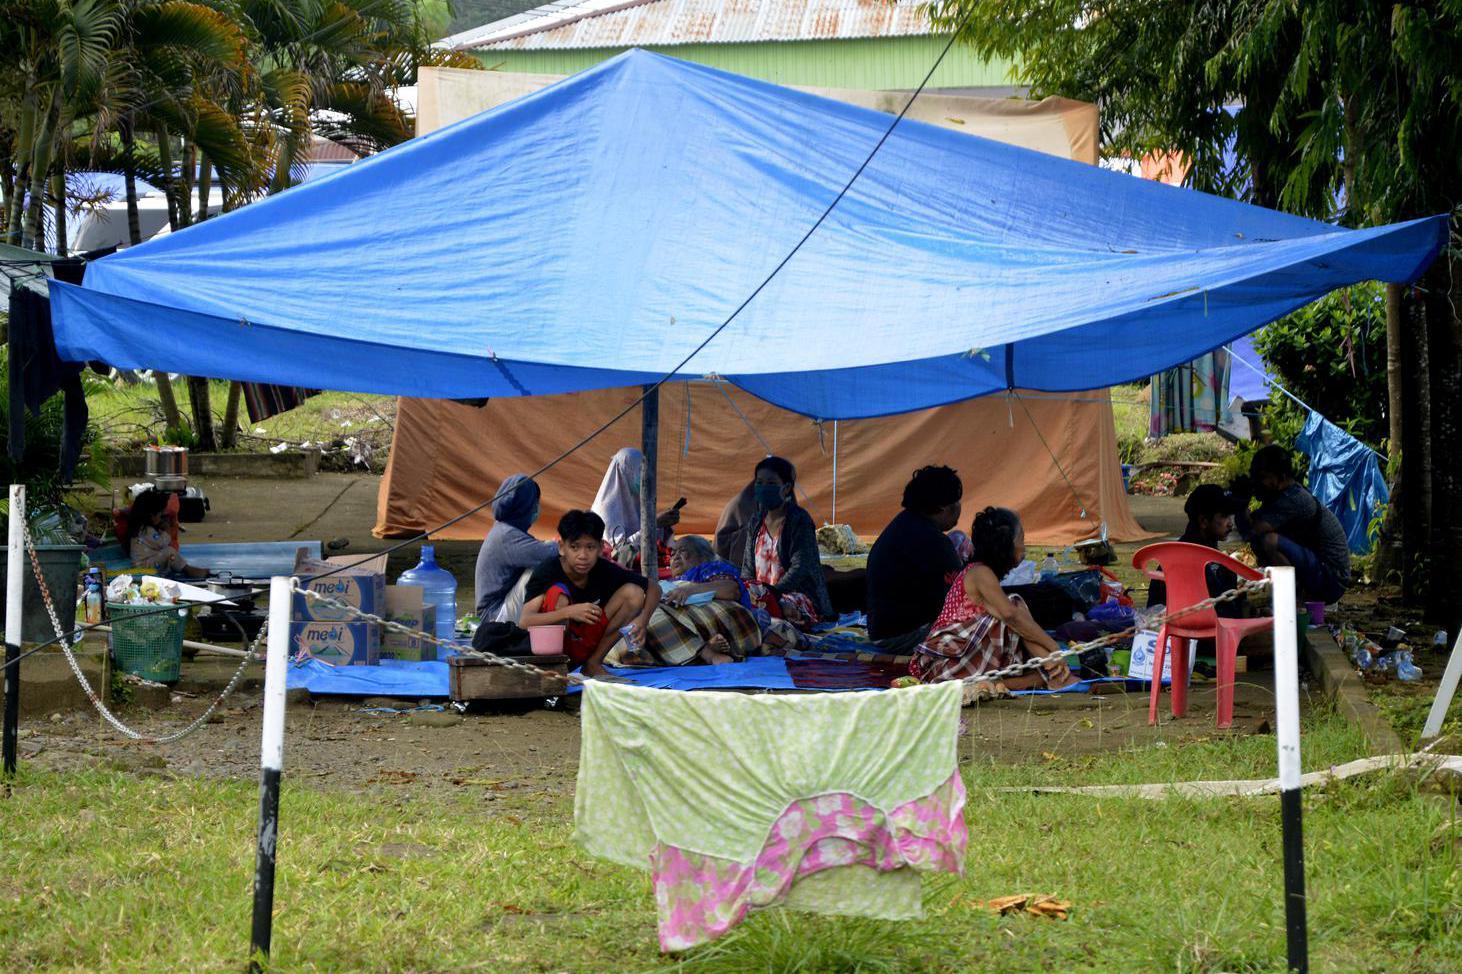 Warga korban gempa bumi mengungsi di halaman Rumah Sakit Umum Kabupaten Mamuju di Sulawesi Barat, Minggu (17/1/2021). Sebanyak 27.850 jiwa telah mengungsi di sejumlah posko pengungsian karena rumah mereka rusak akibat gempa bumi berkekuatan magnitudo 6,2 yang terjadi pada Jumat (15/1) dini hari yang juga mengakibatkan 73 orang meninggal dunia.